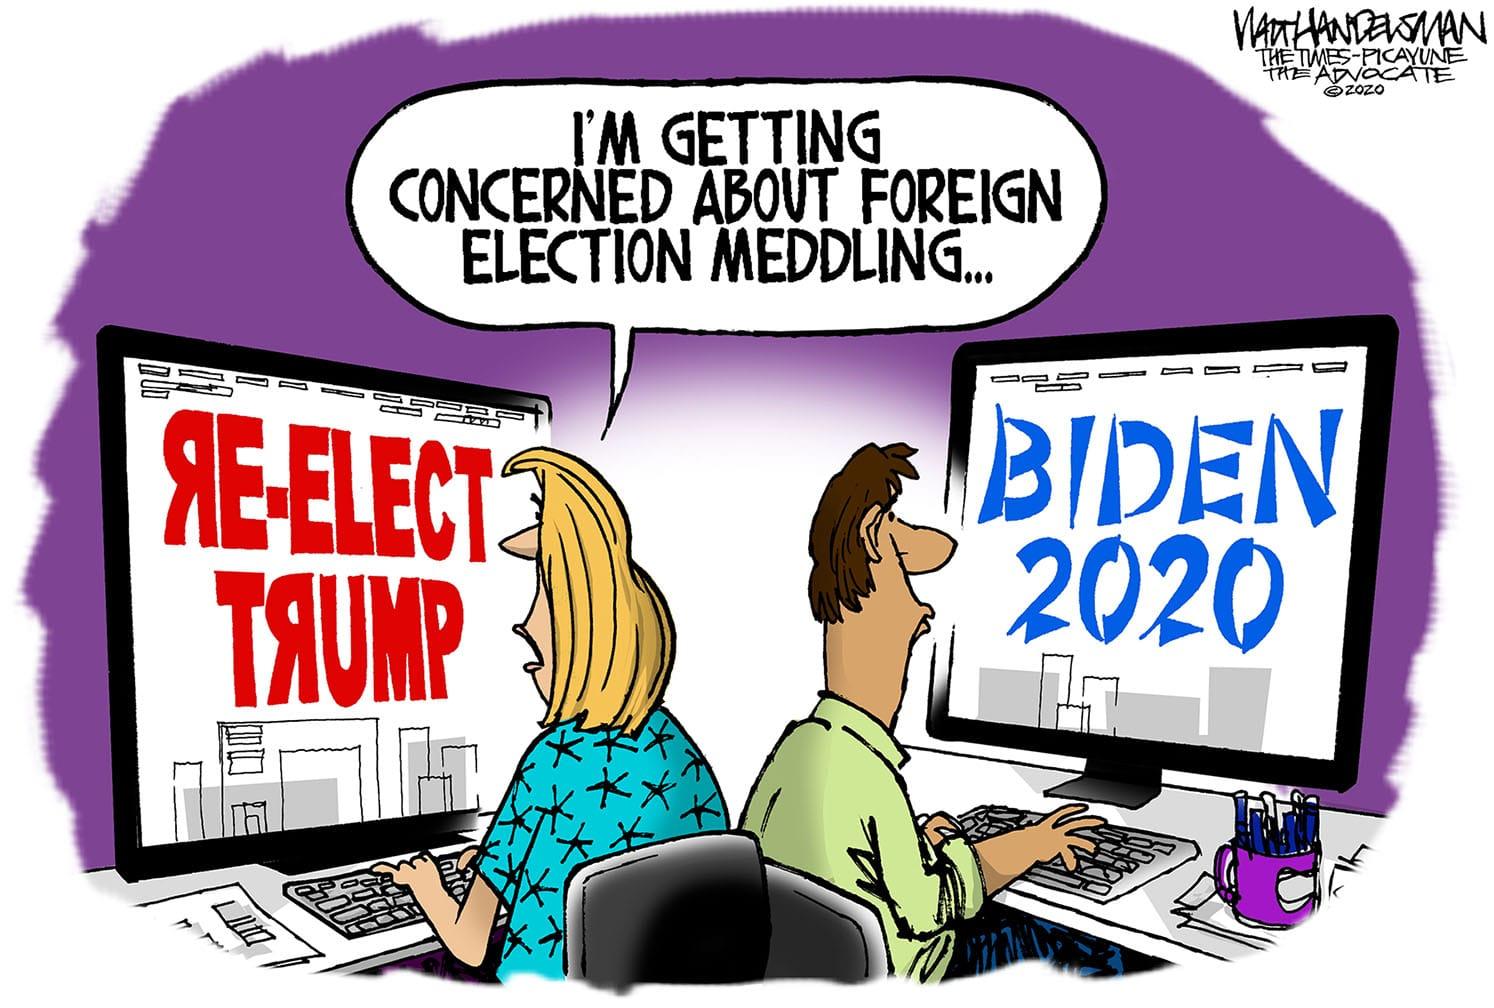 Aug. 15: Election Meddling